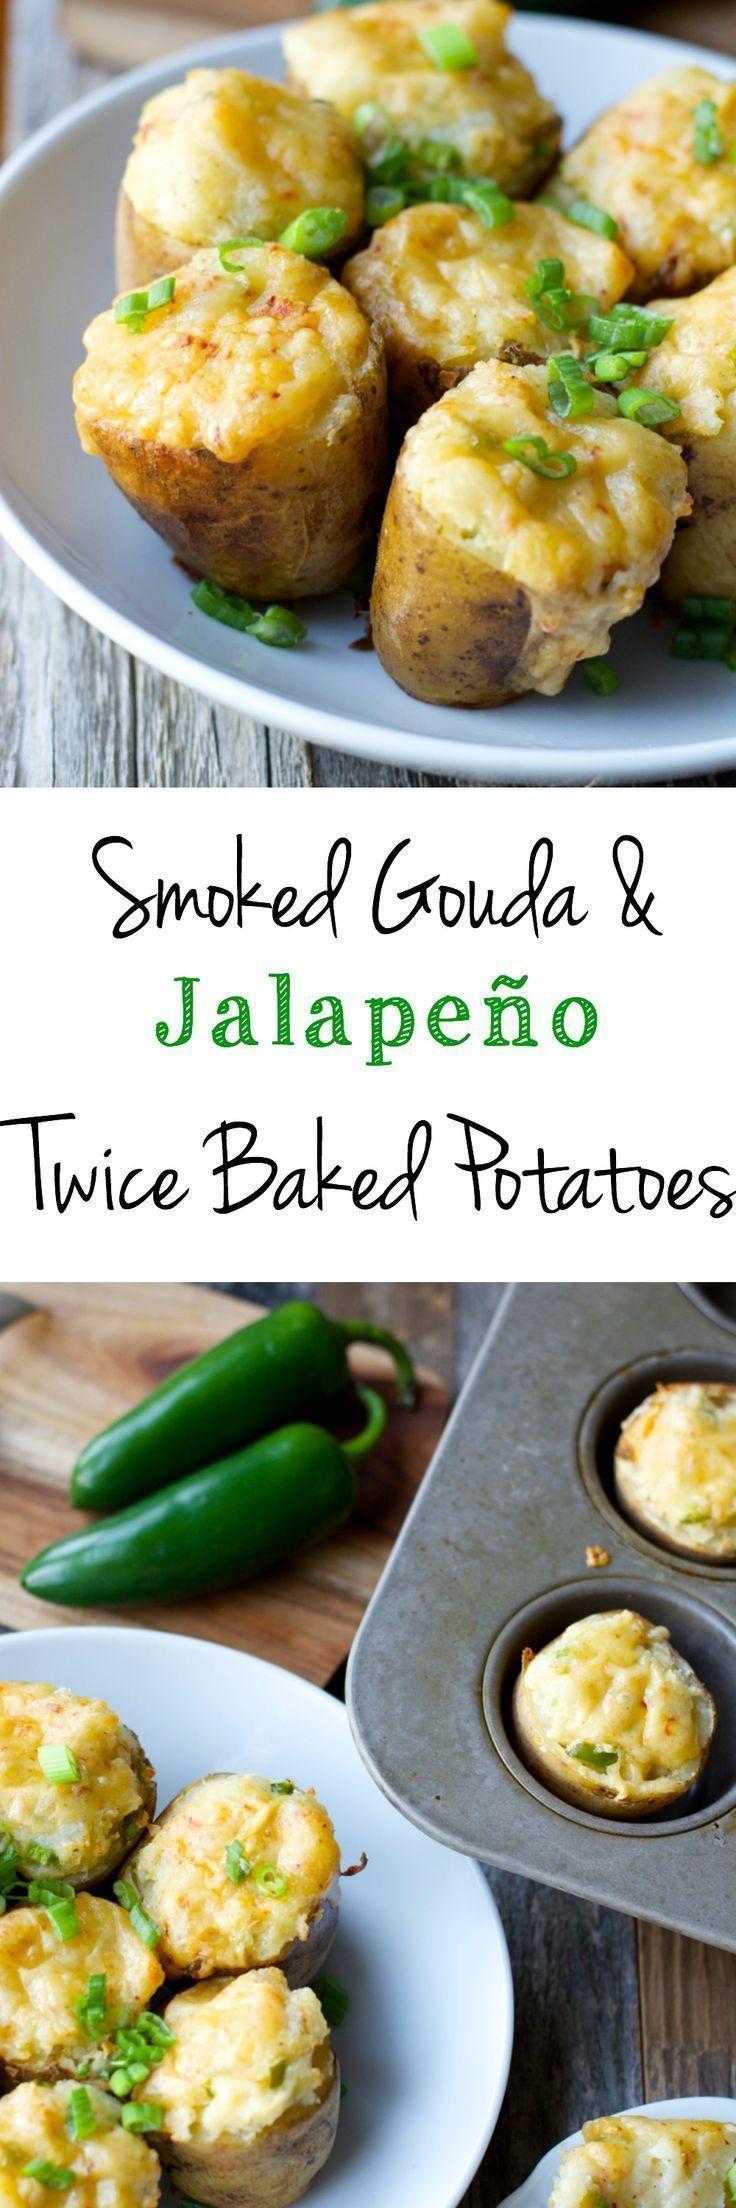 ... Food Group on Pinterest | Potato salad, Bacon and Baked sweet potatoes